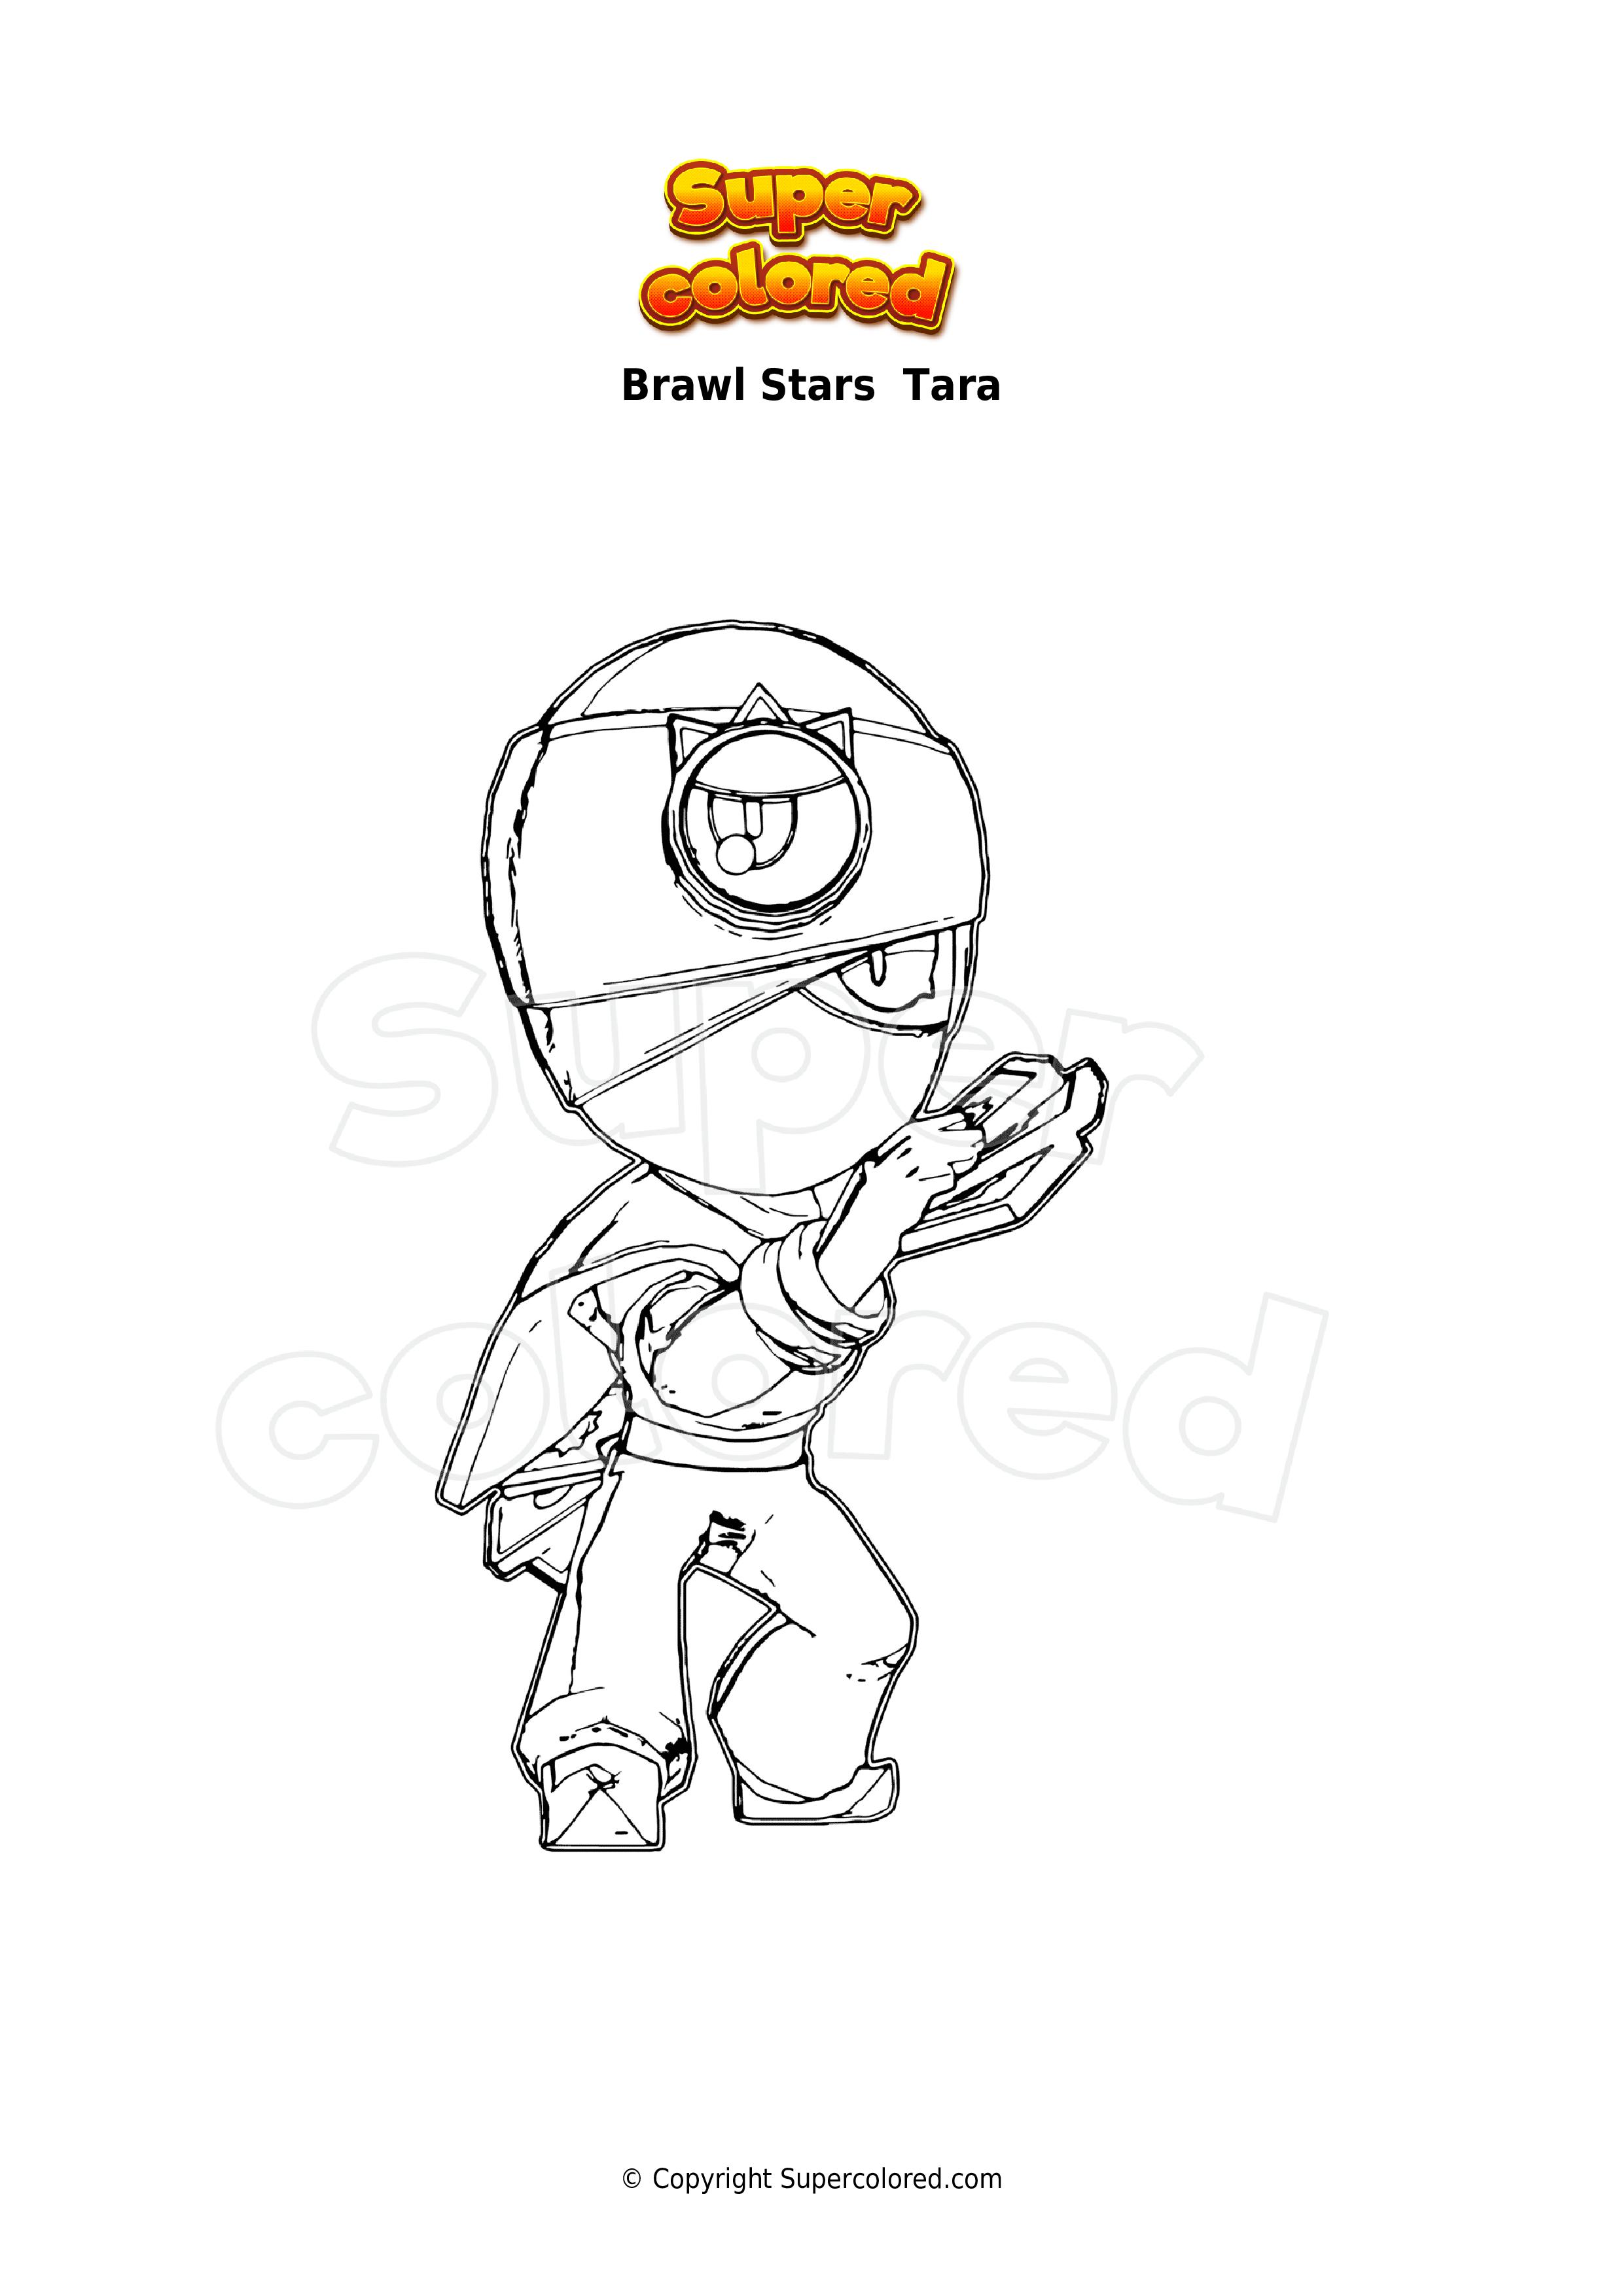 Ausmalbild Brawl Stars Tara - Supercolored.com